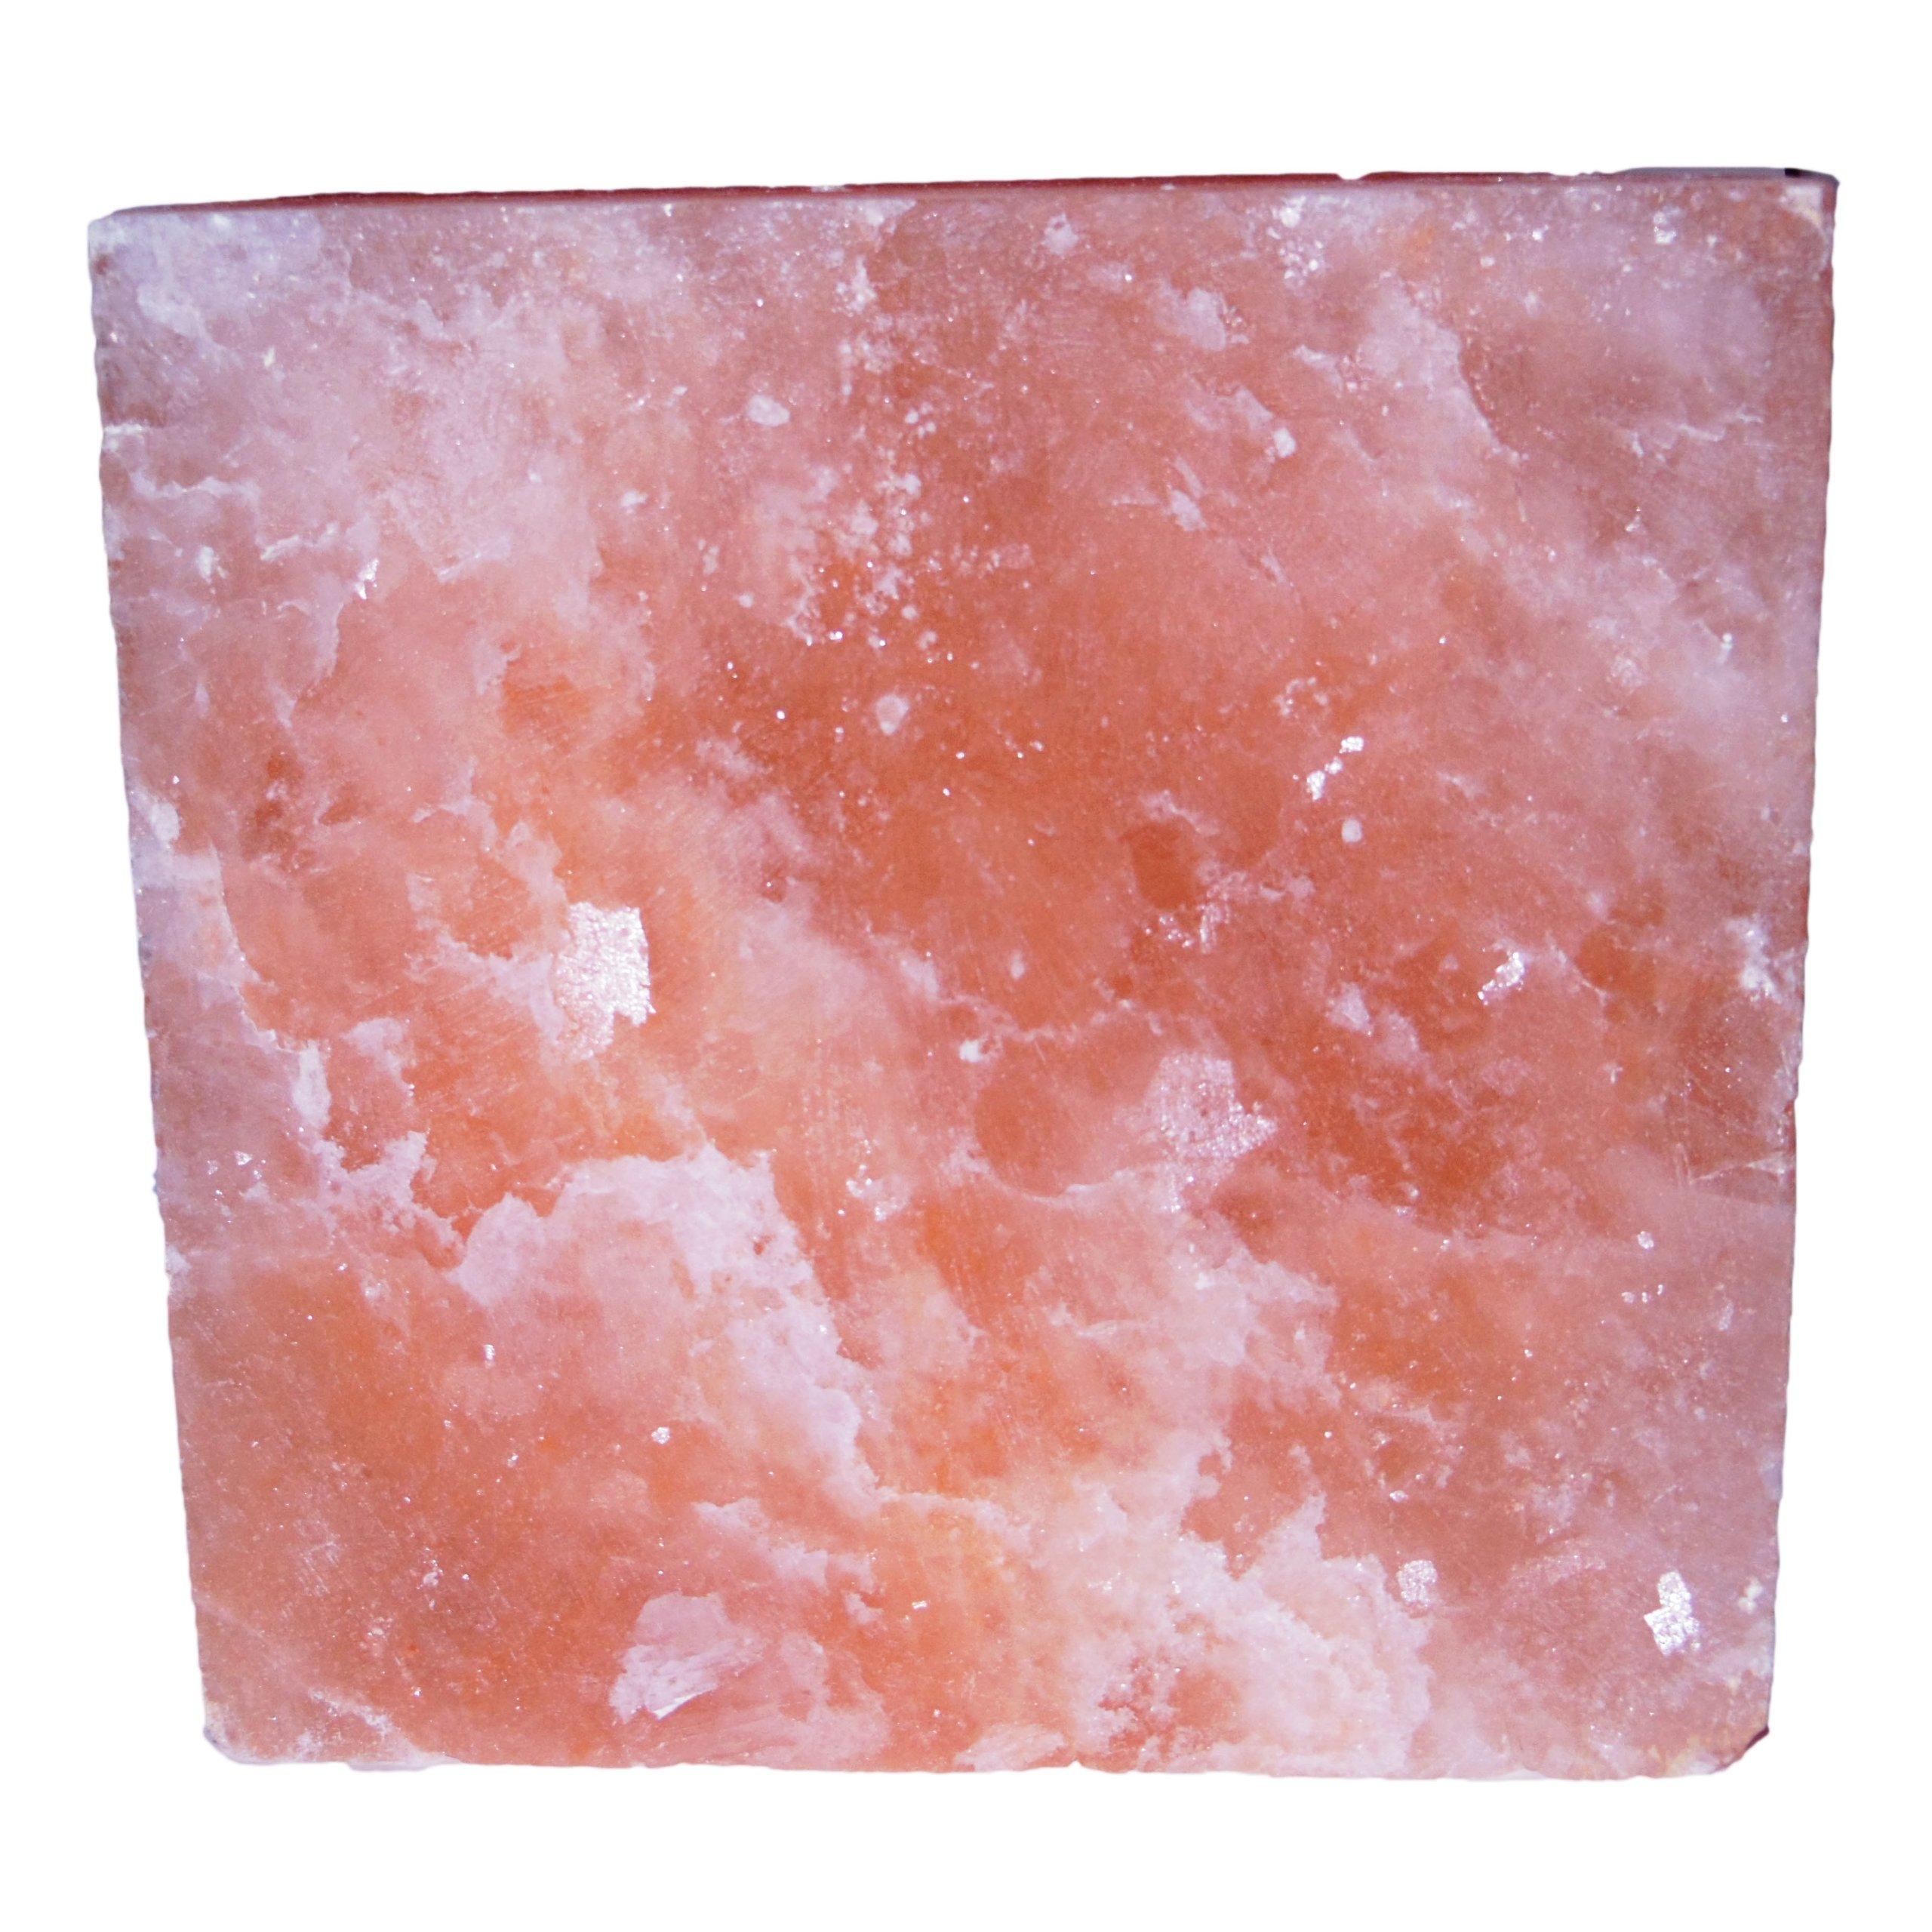 Natural Himalayan Salt Plate / Slab / Block Pink Square 8x8x2-Inch by SaltSkil (Image #2)